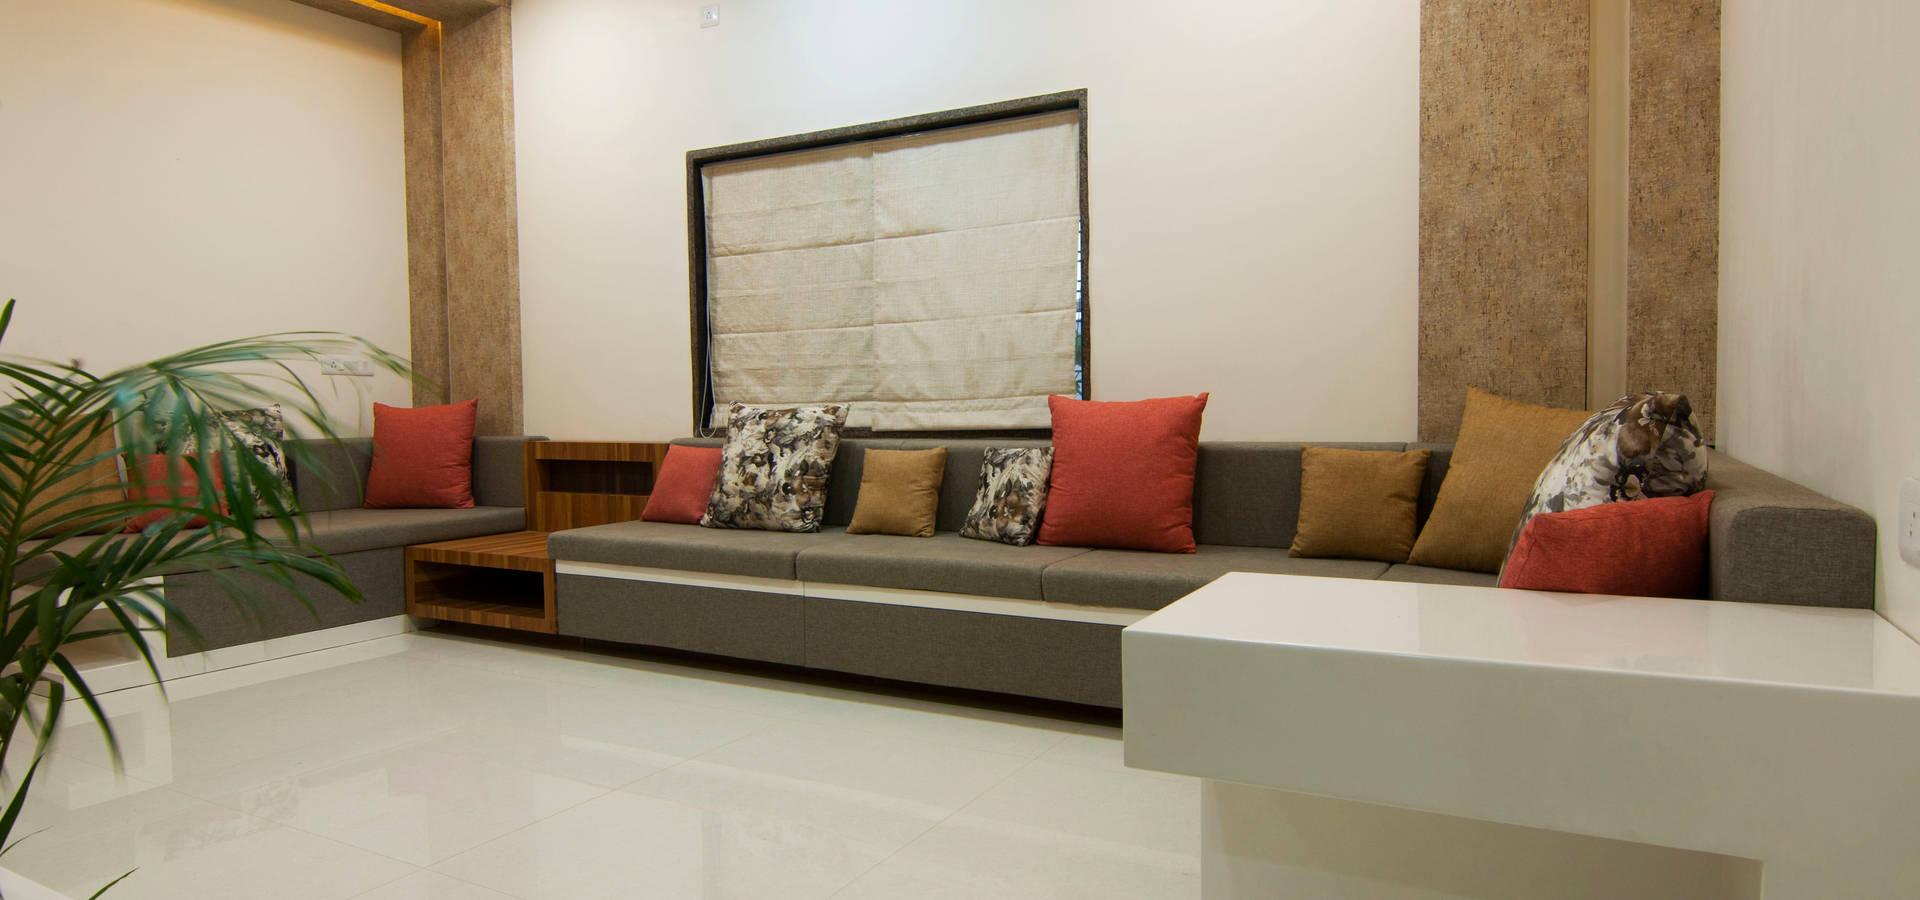 ABHA Design Studio